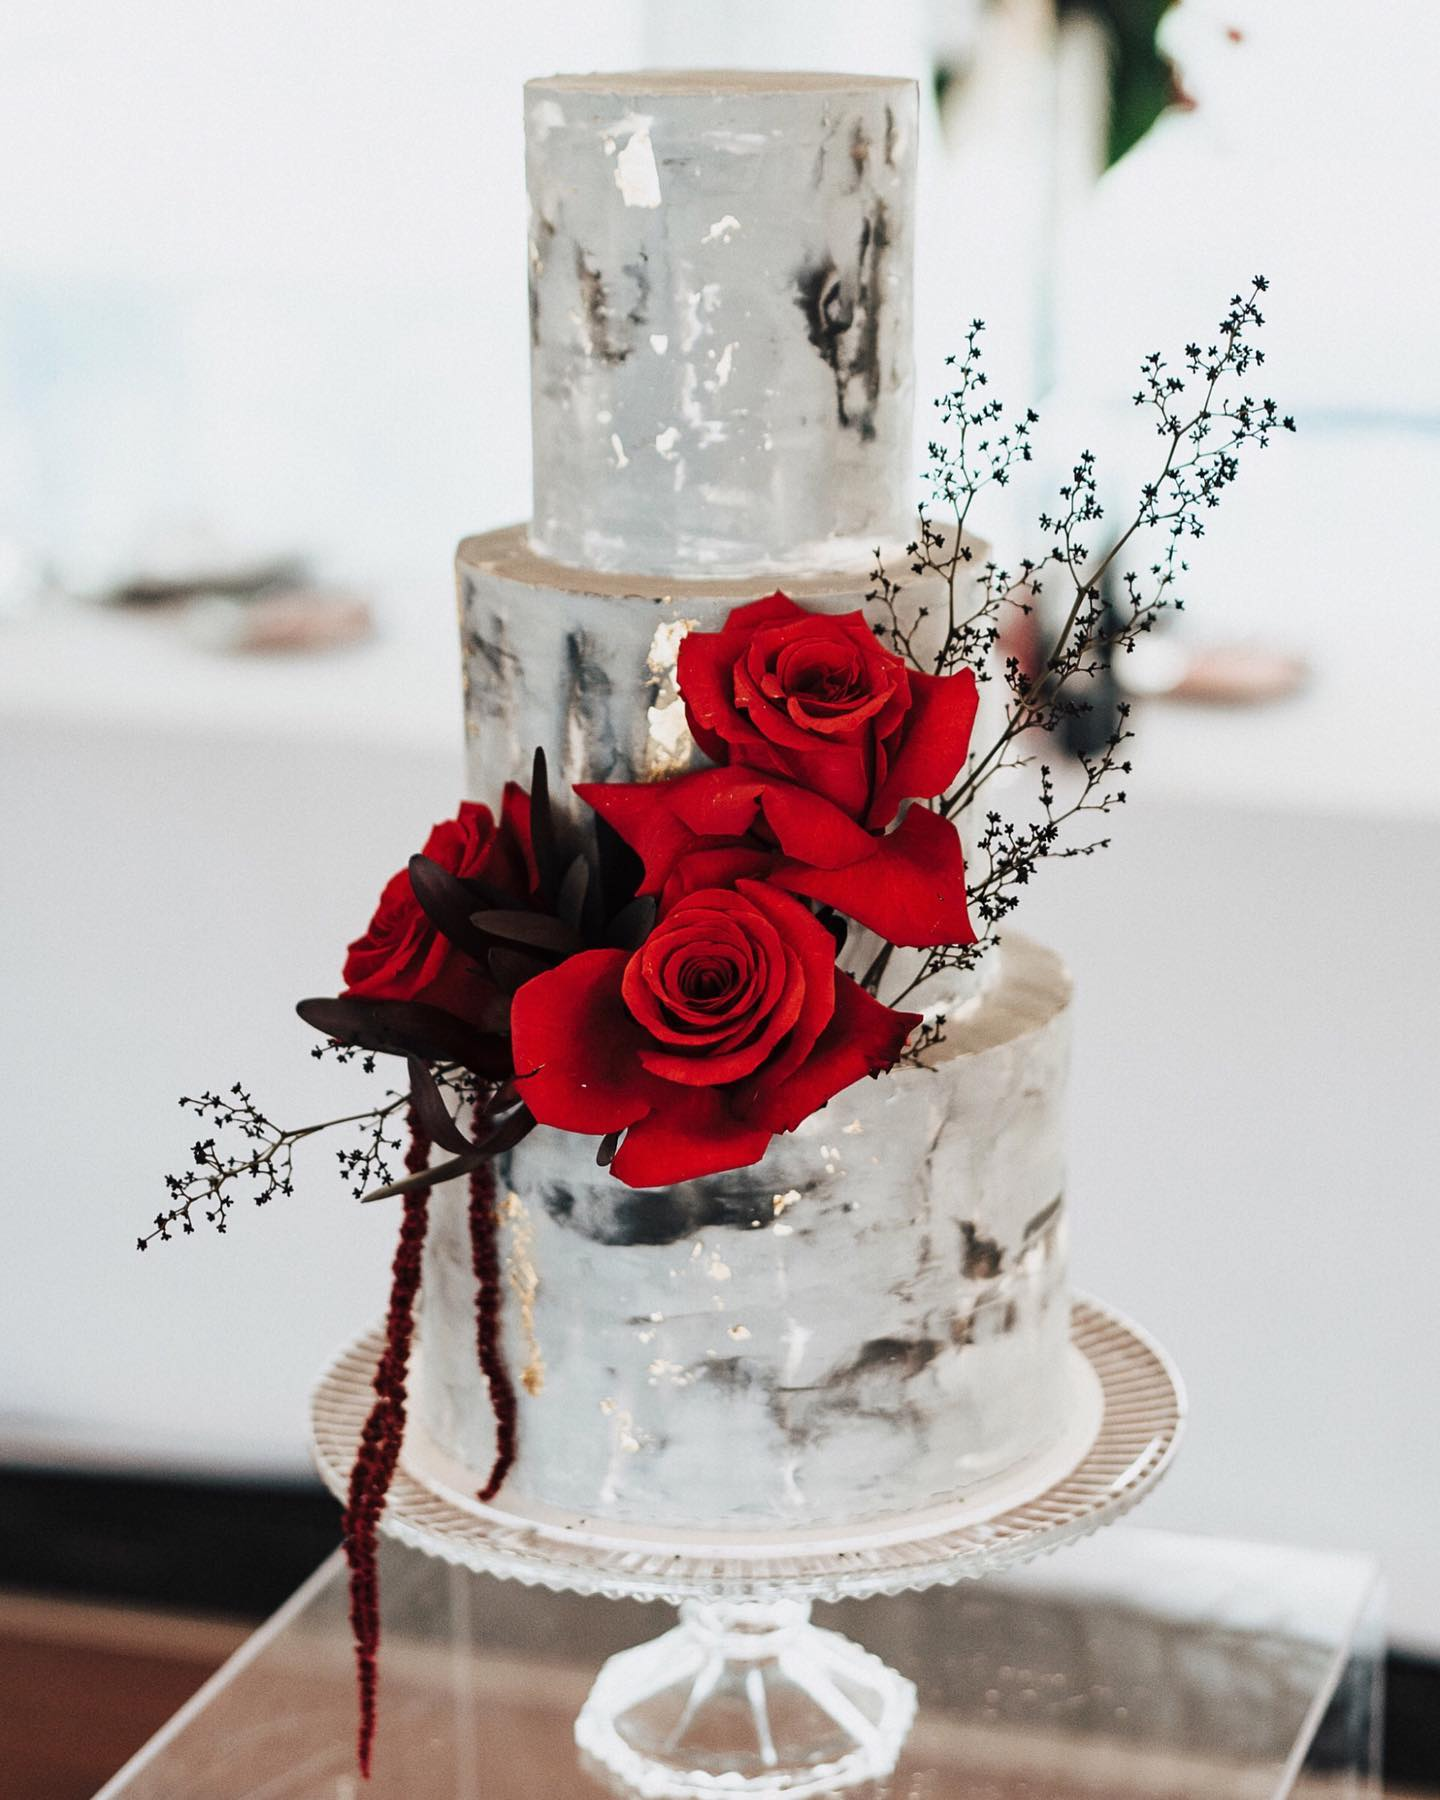 le camo photography wedding cakes perth to the aisle australia floral 3 tier cake